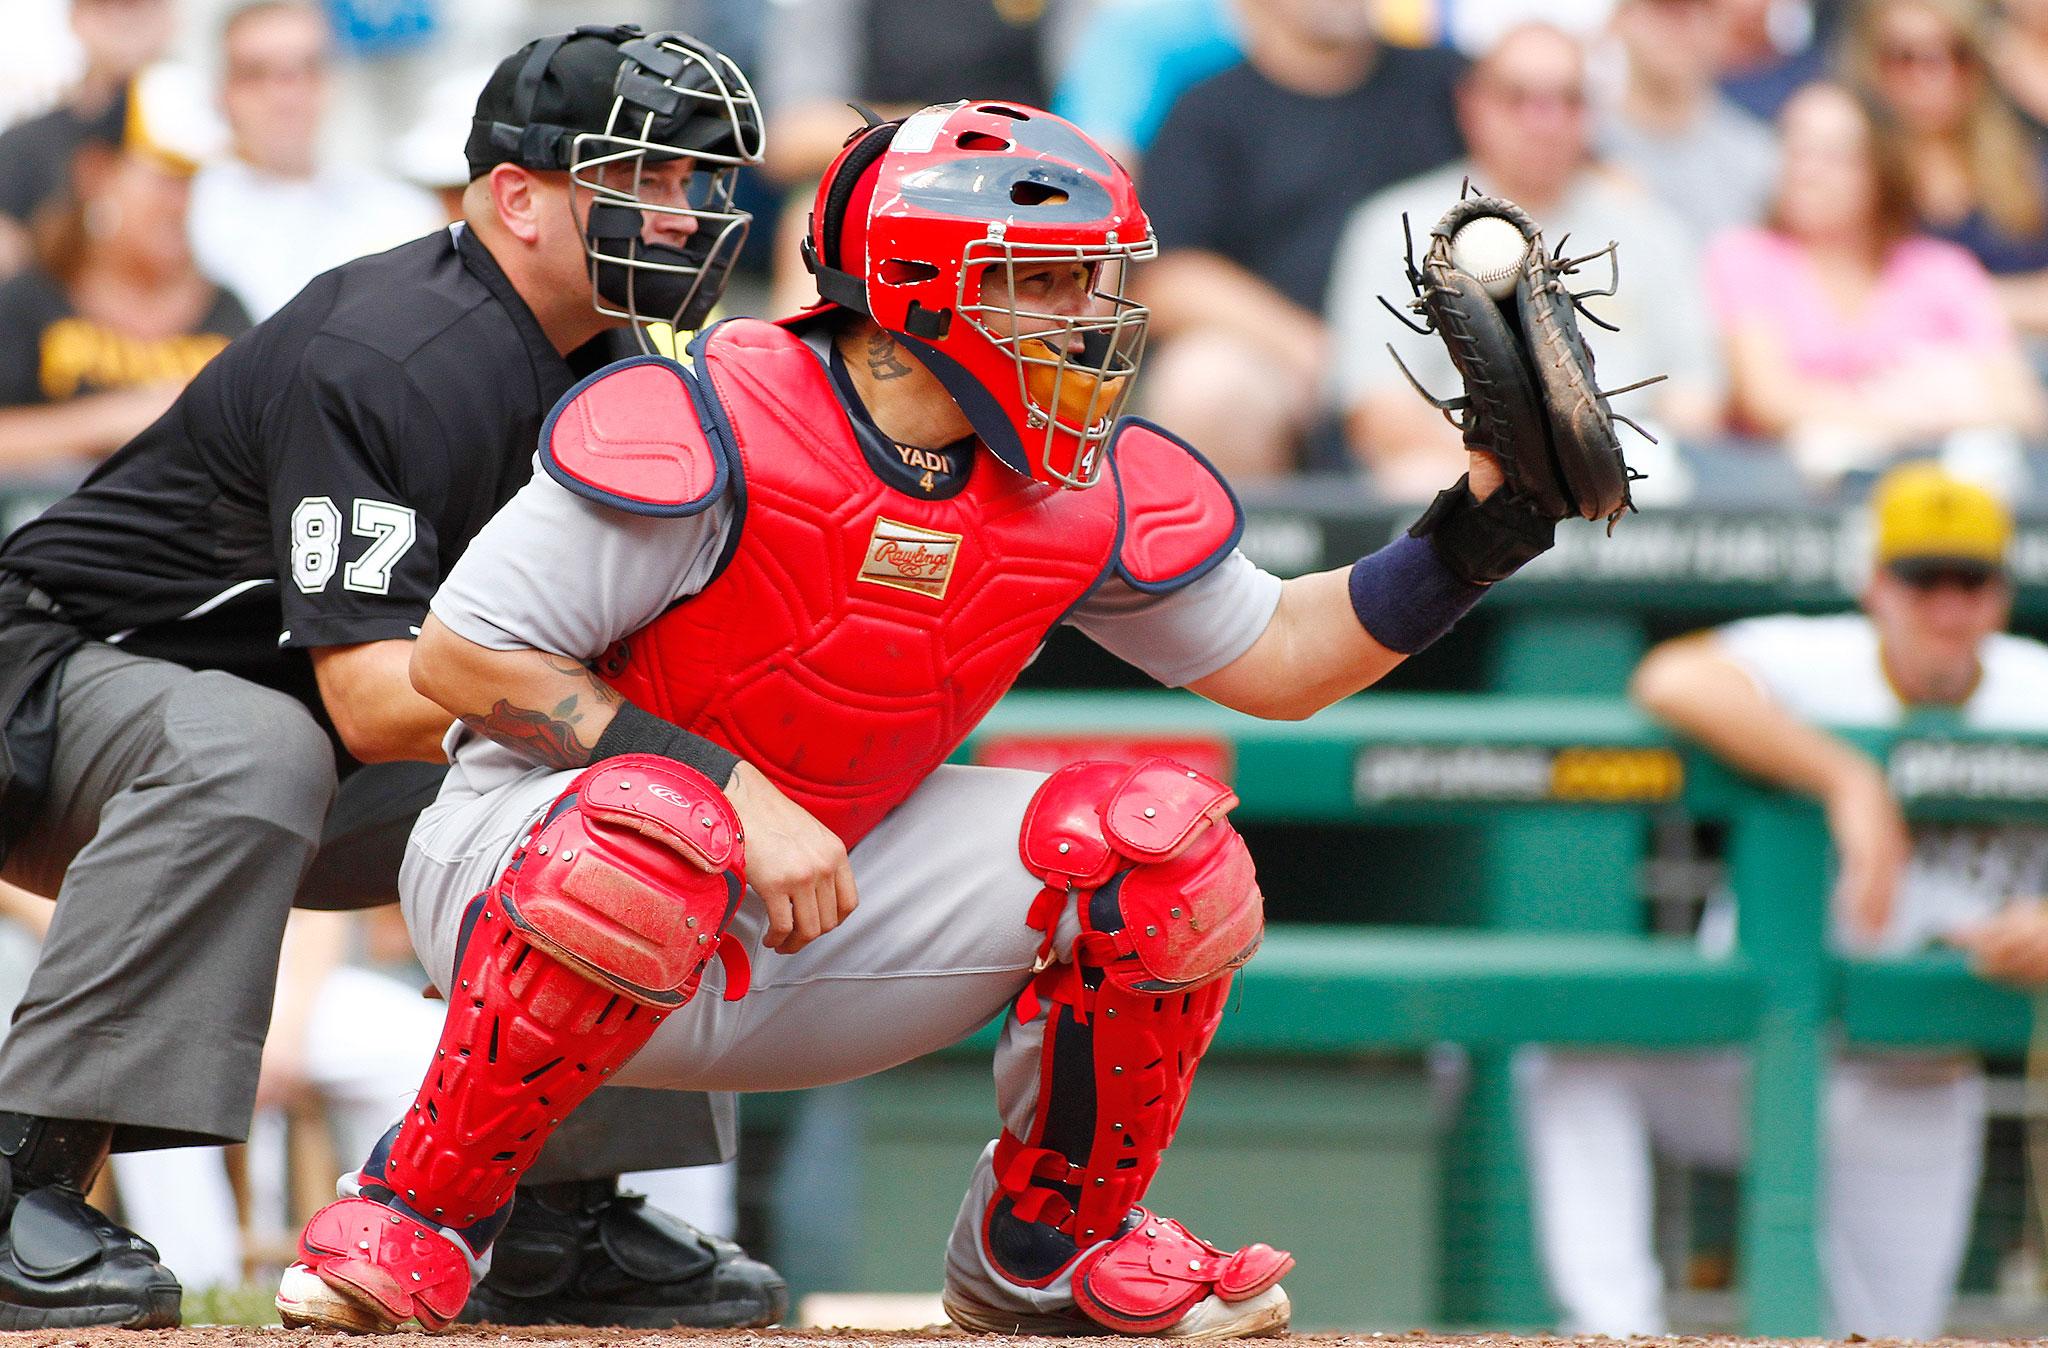 Yadier Molina Catching 2013 Catcher: Yadier Molina...